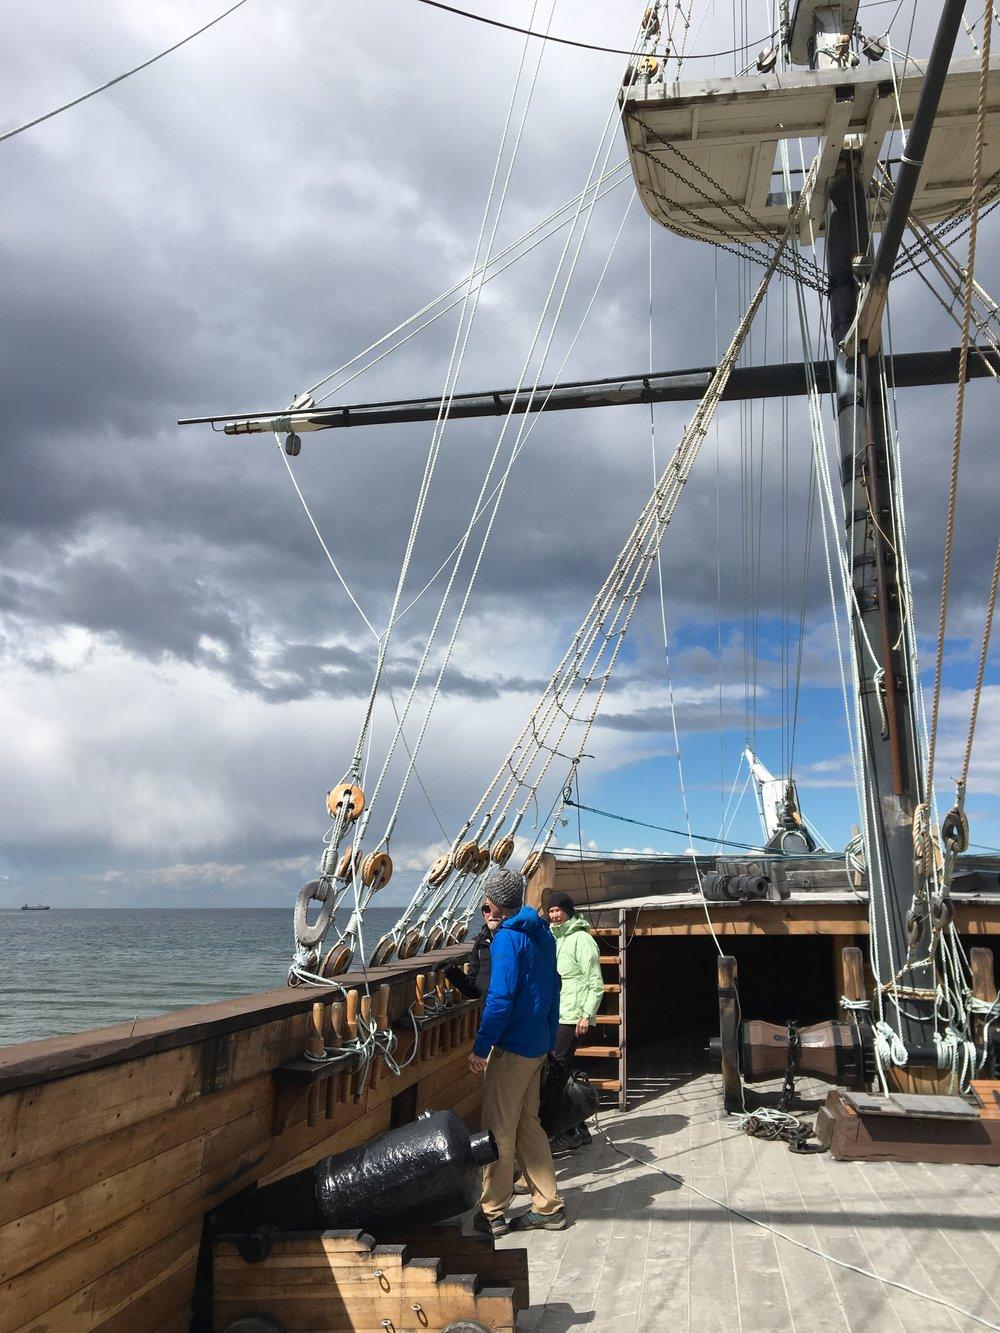 HMS Beagle replica at Nao Victoria Museum Punta Arenas, Chile